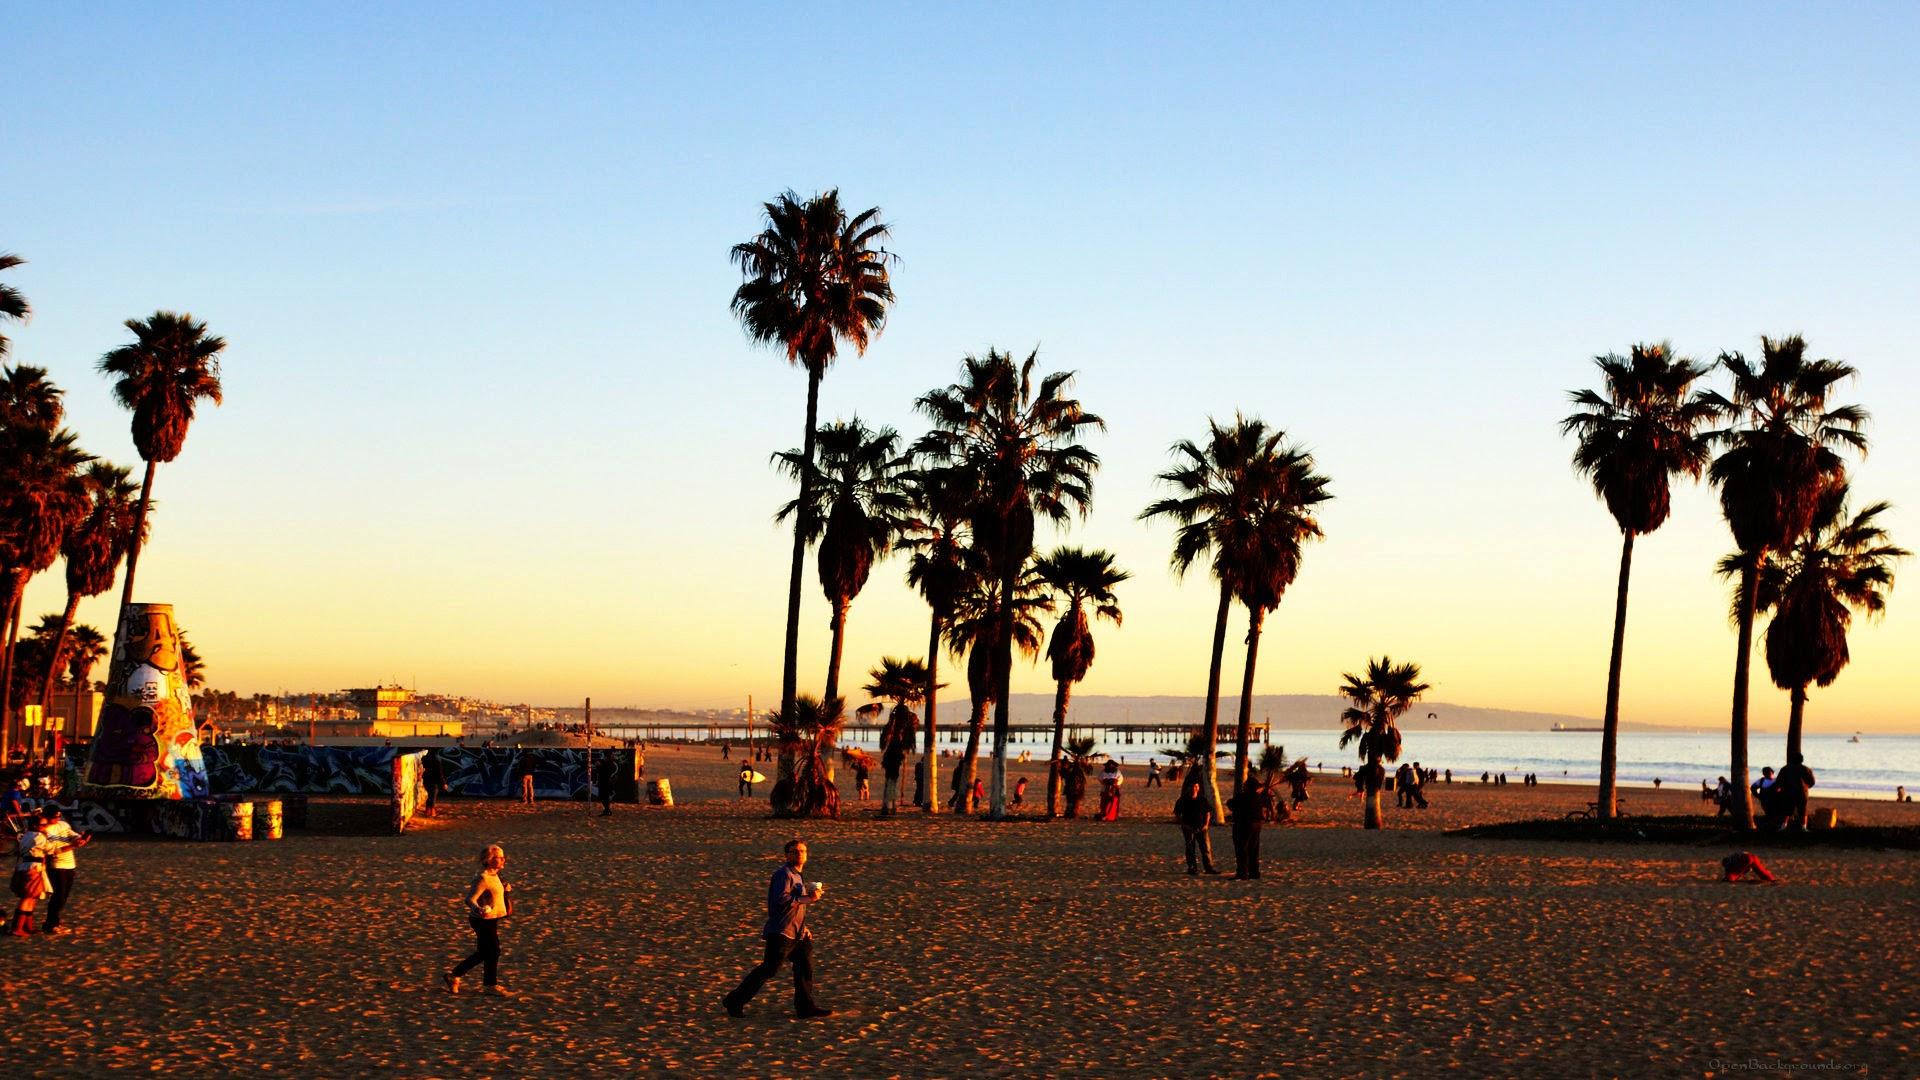 download image venice beach - photo #13